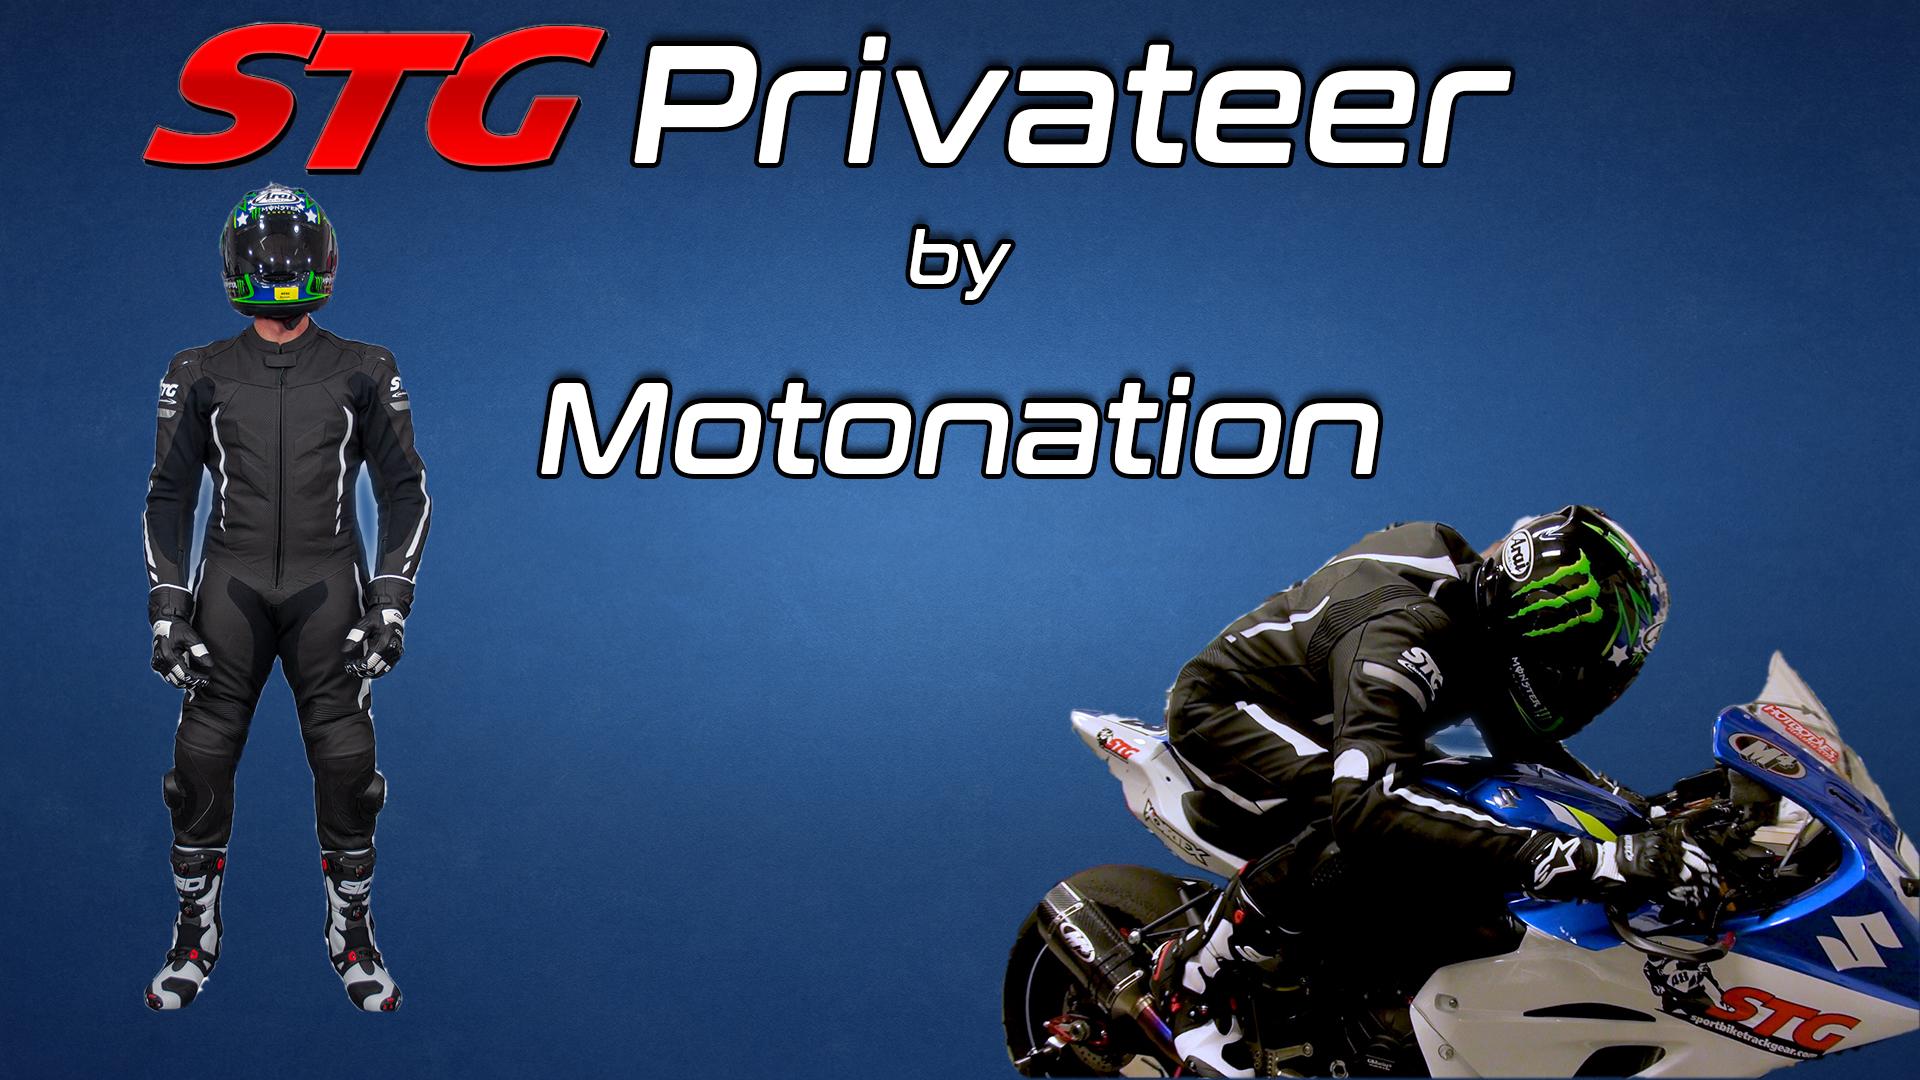 STG Privateer Race Suit by Motonation